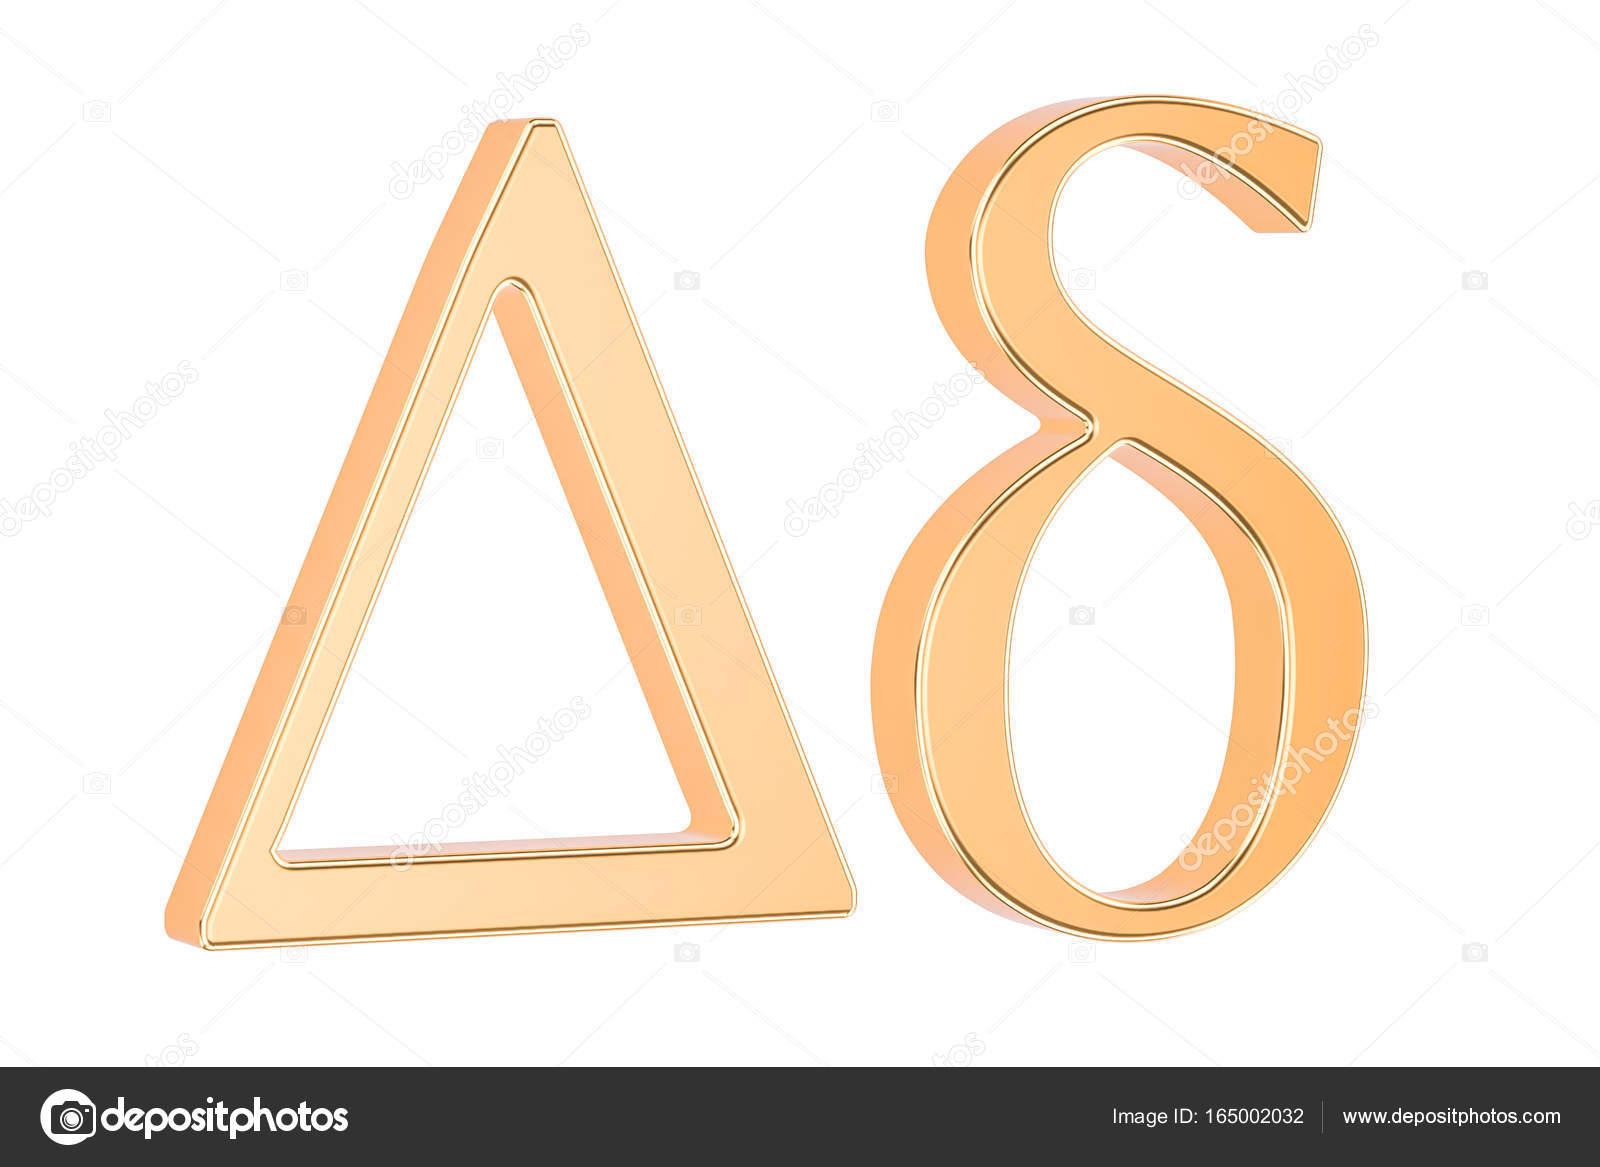 Golden greek letter delta 3d rendering stock photo alexlmx golden greek letter delta 3d rendering stock photo biocorpaavc Choice Image